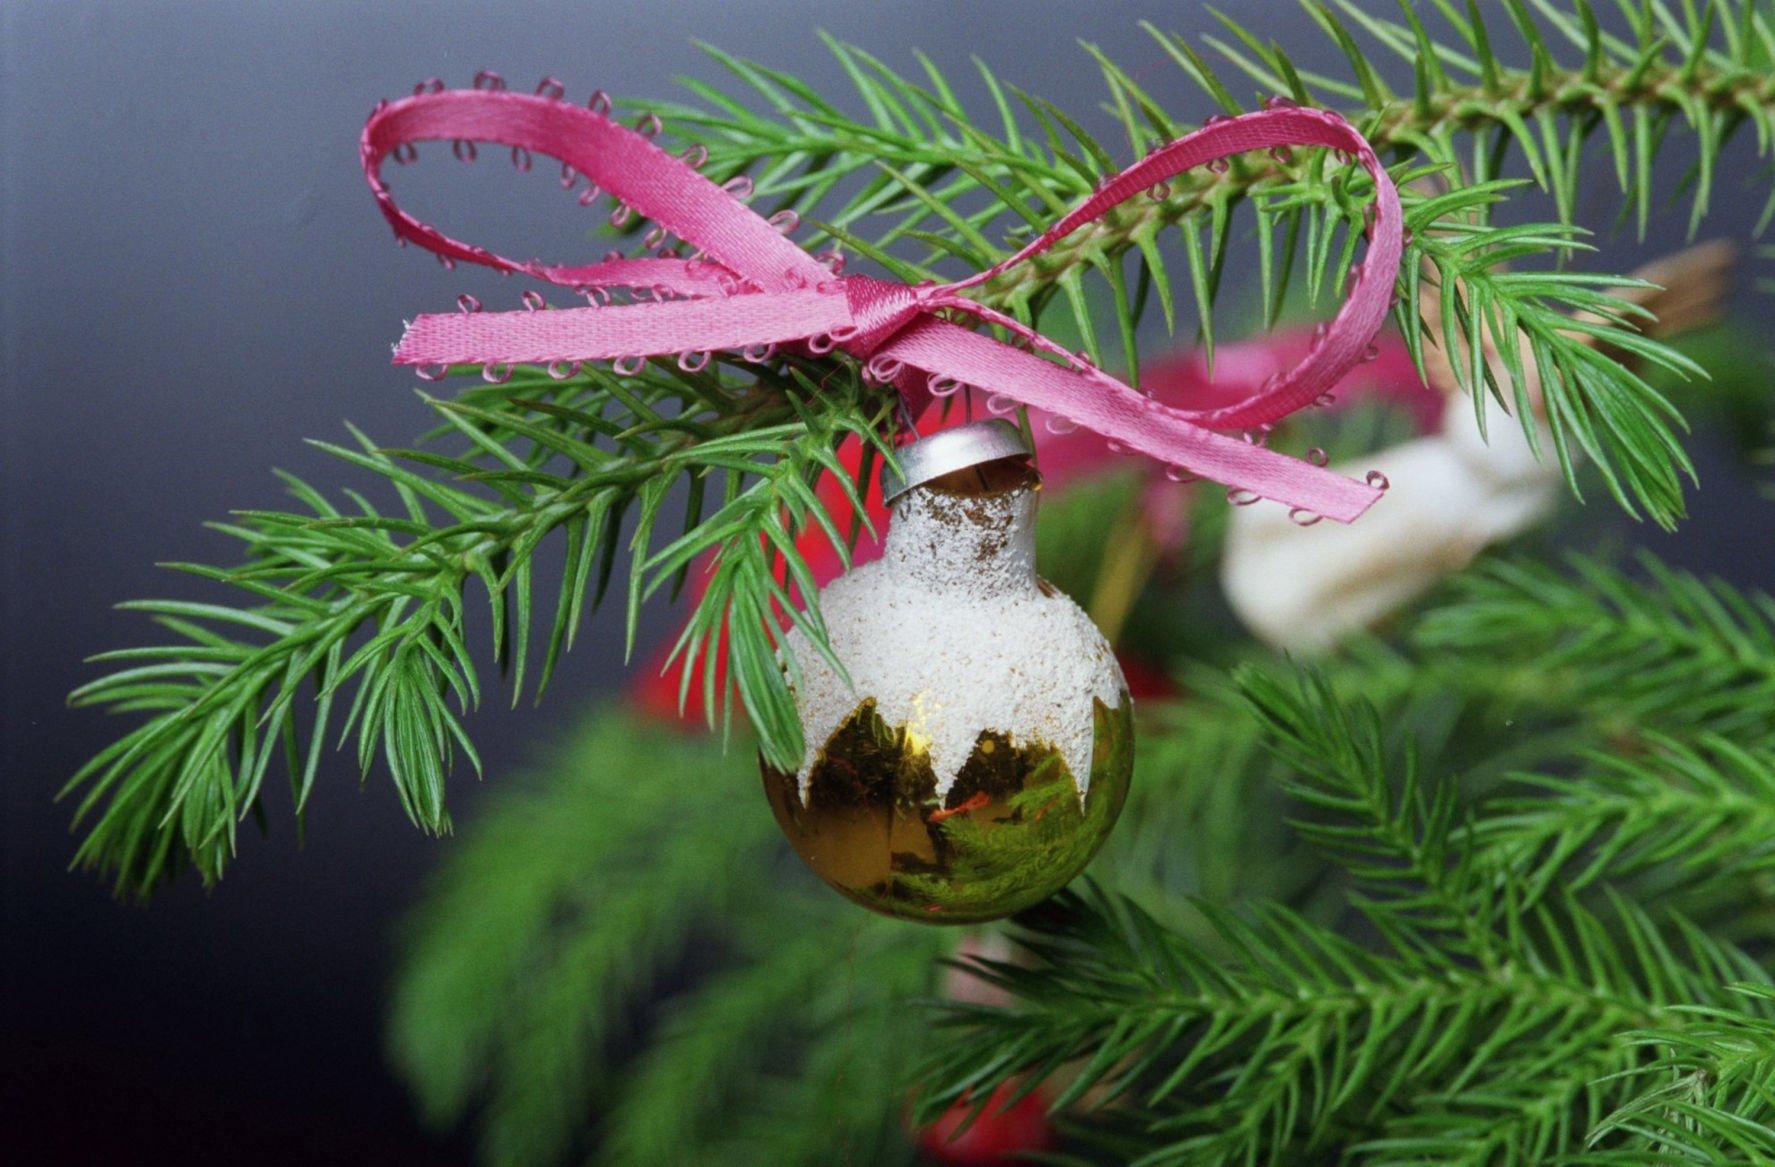 This House Plant Makes An Alternative Christmas Tree Rapidcityjournal Com